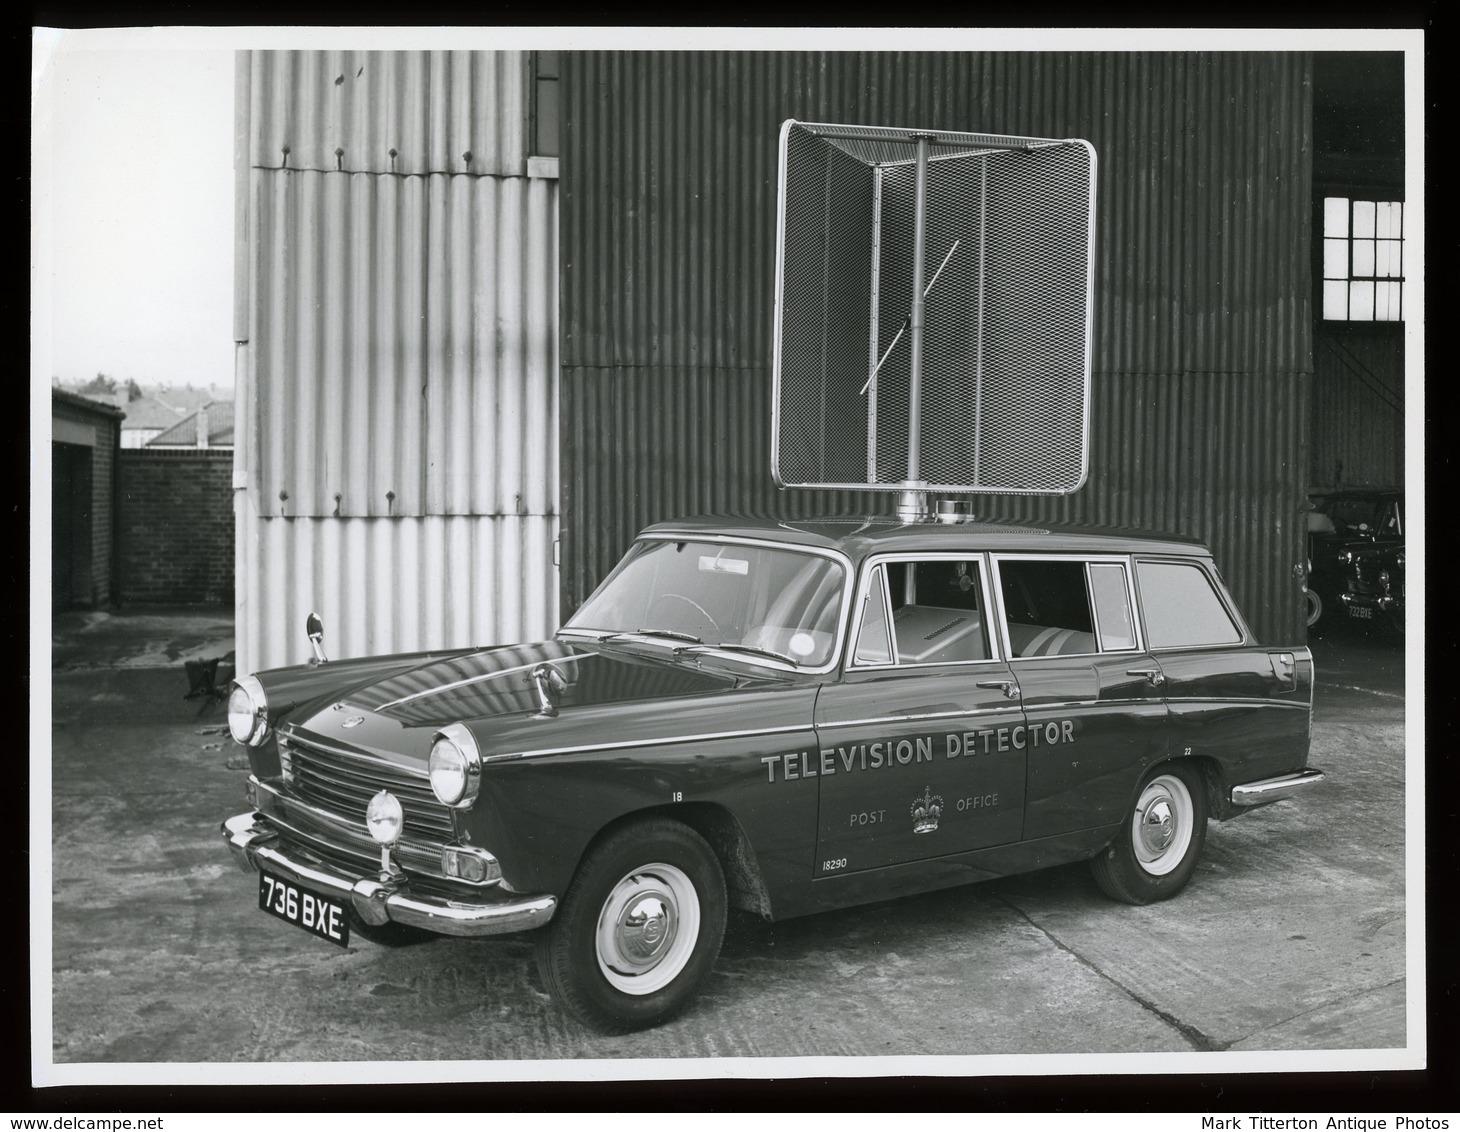 Original Photograph - Post Office Telephones - Television Detector Car - C.1960s (21 X 16cm) - Foto